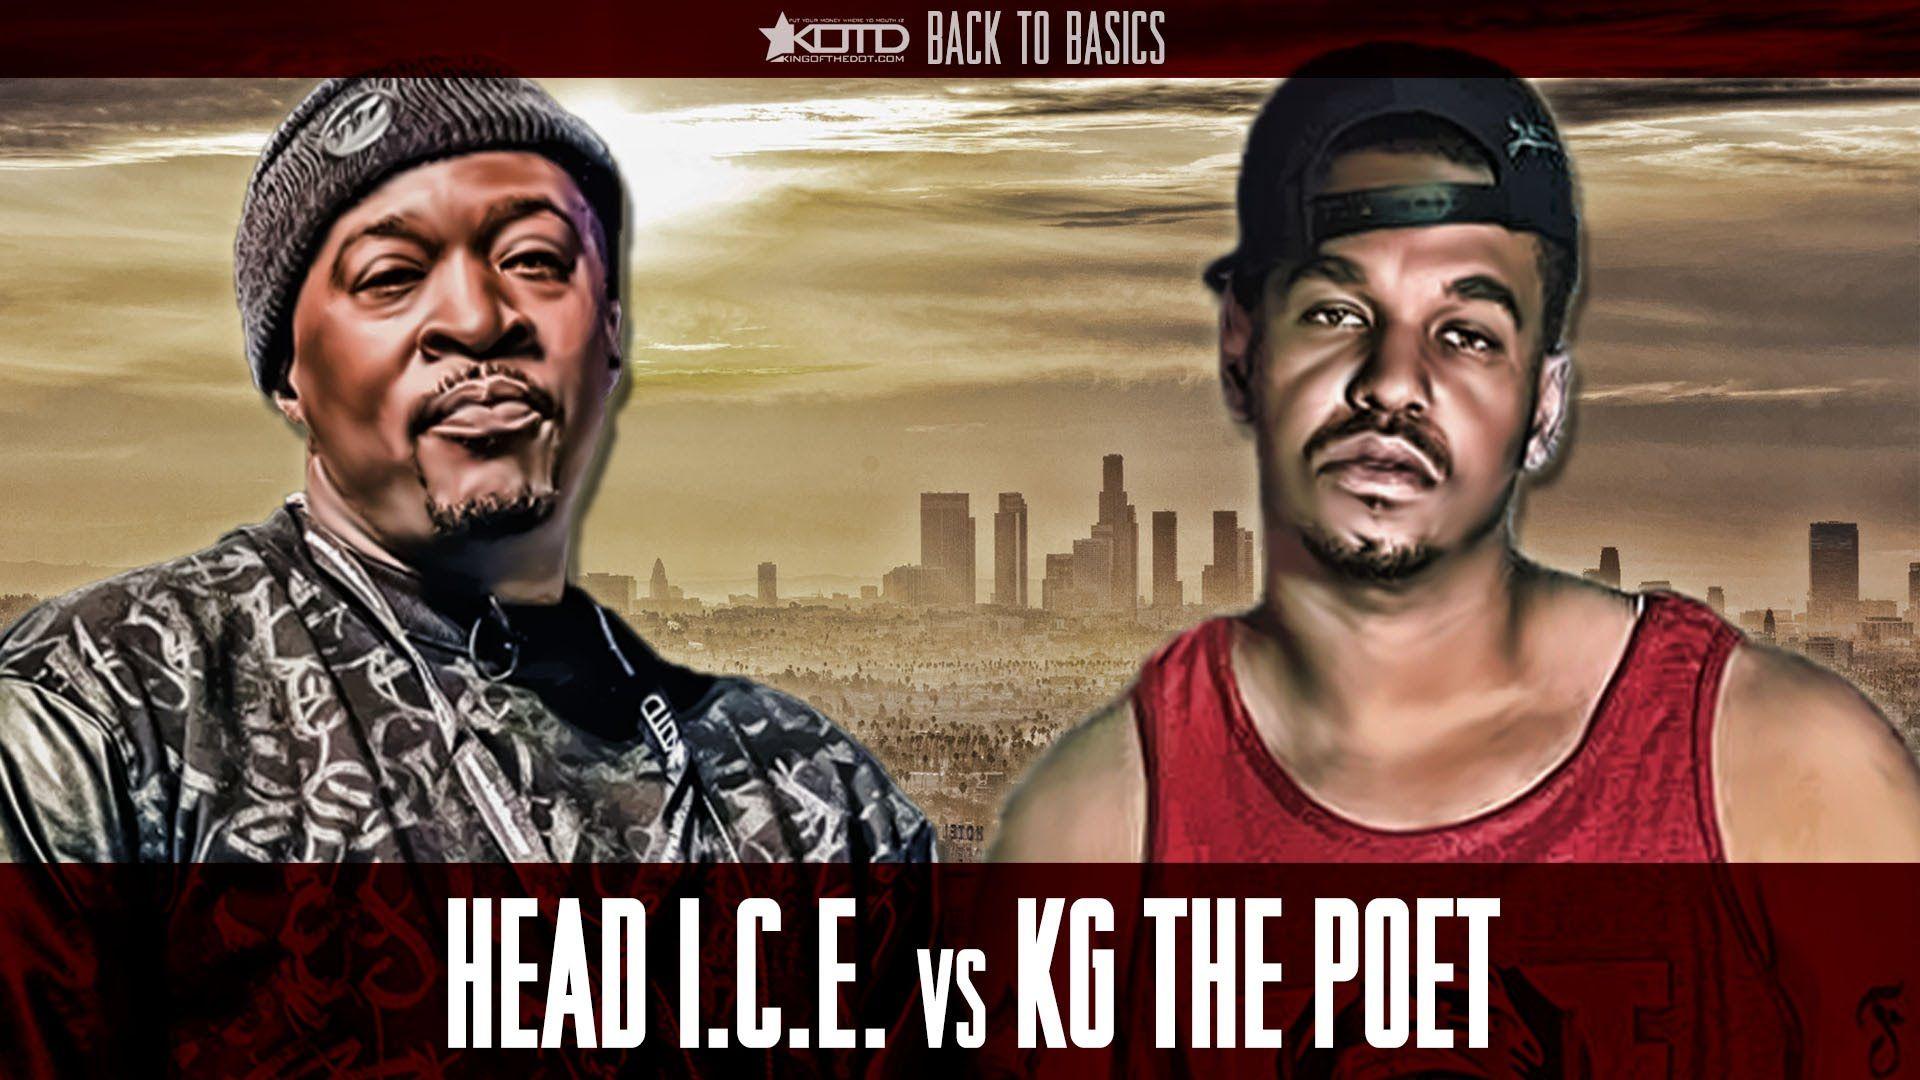 KOTD - Rap Battle - Head I.C.E. vs Kg The Poet